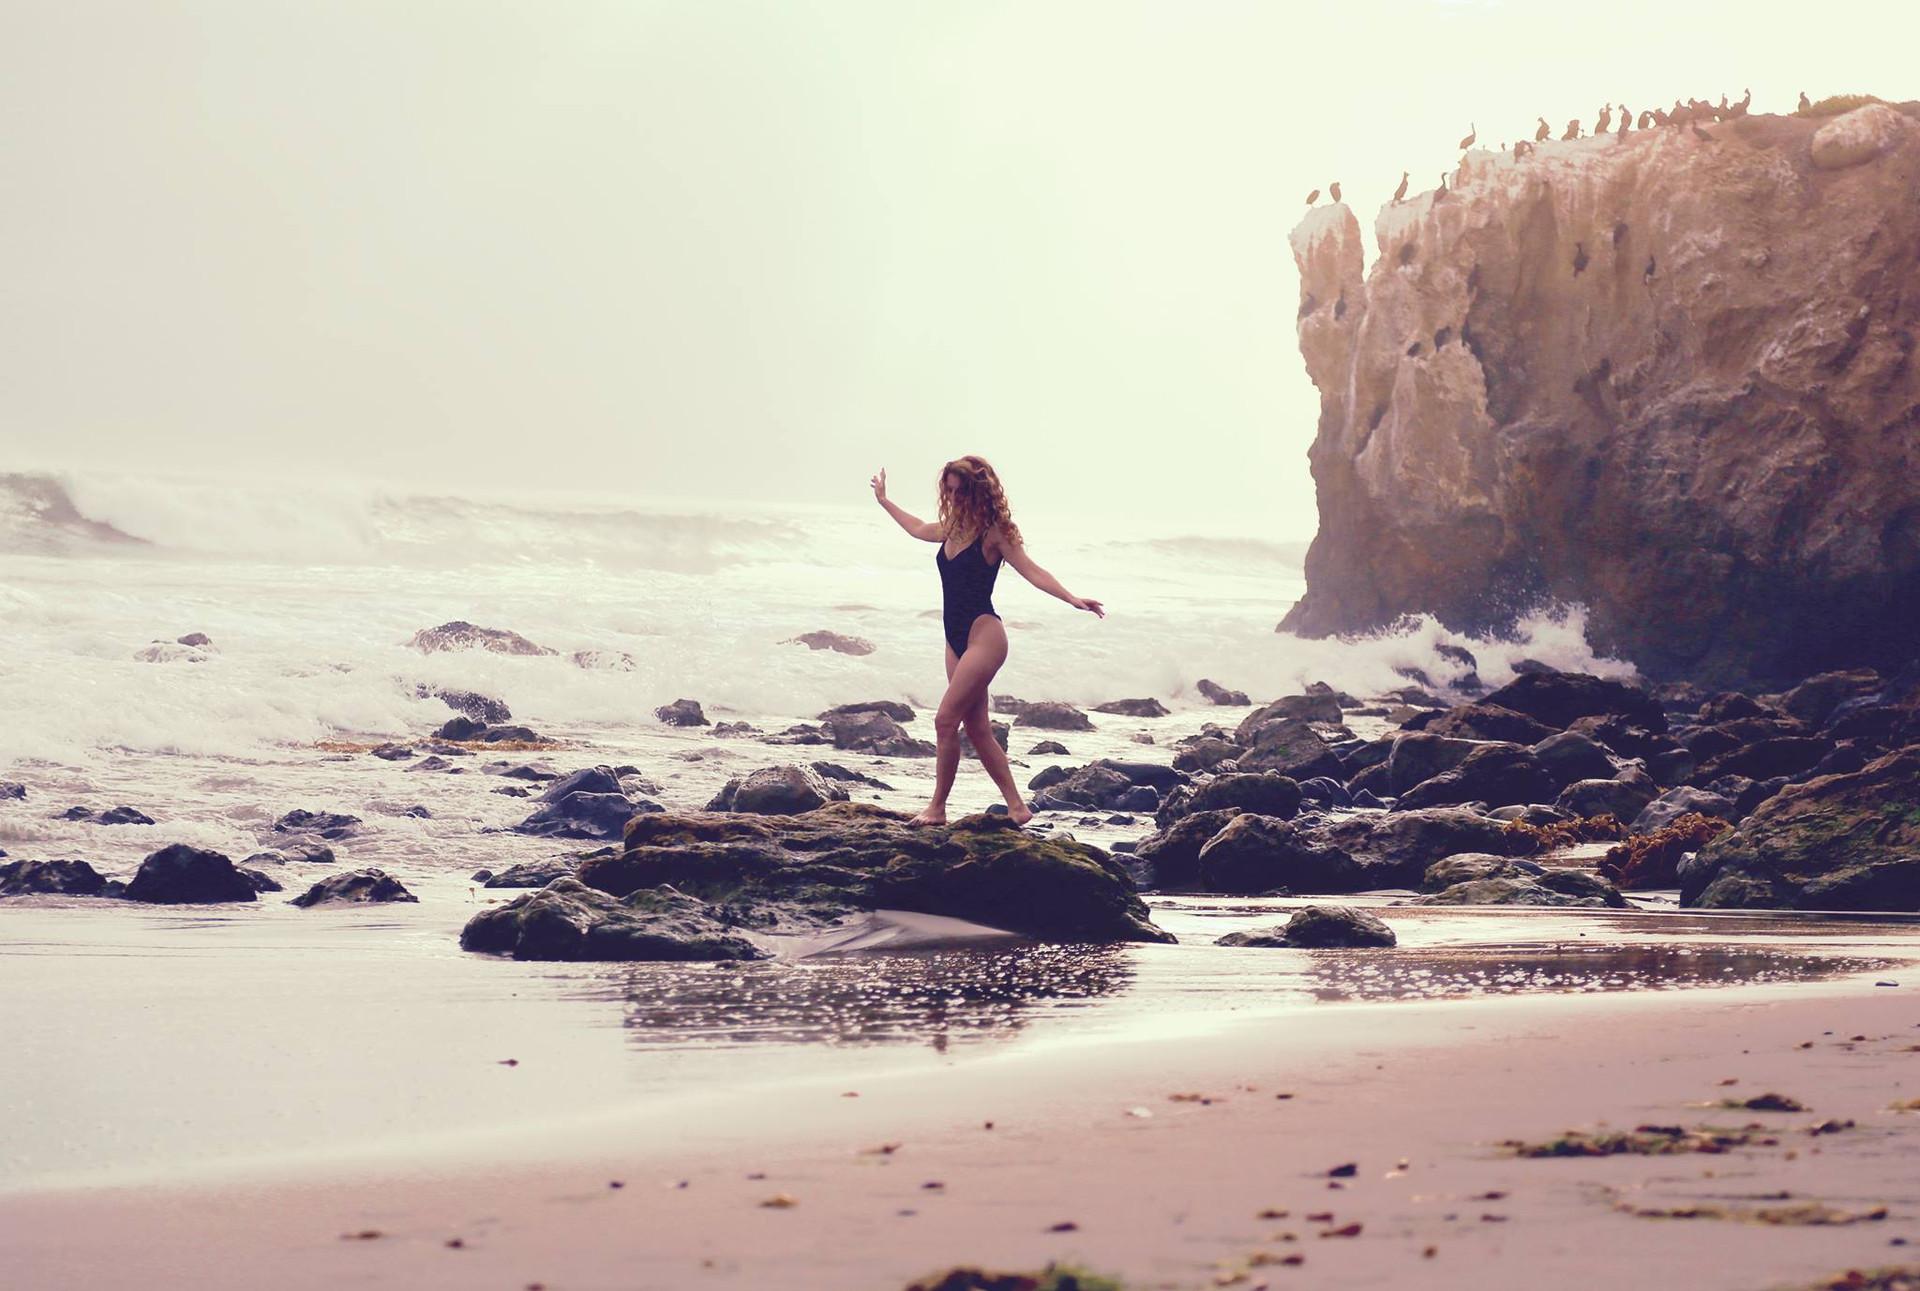 Malibu, 2013